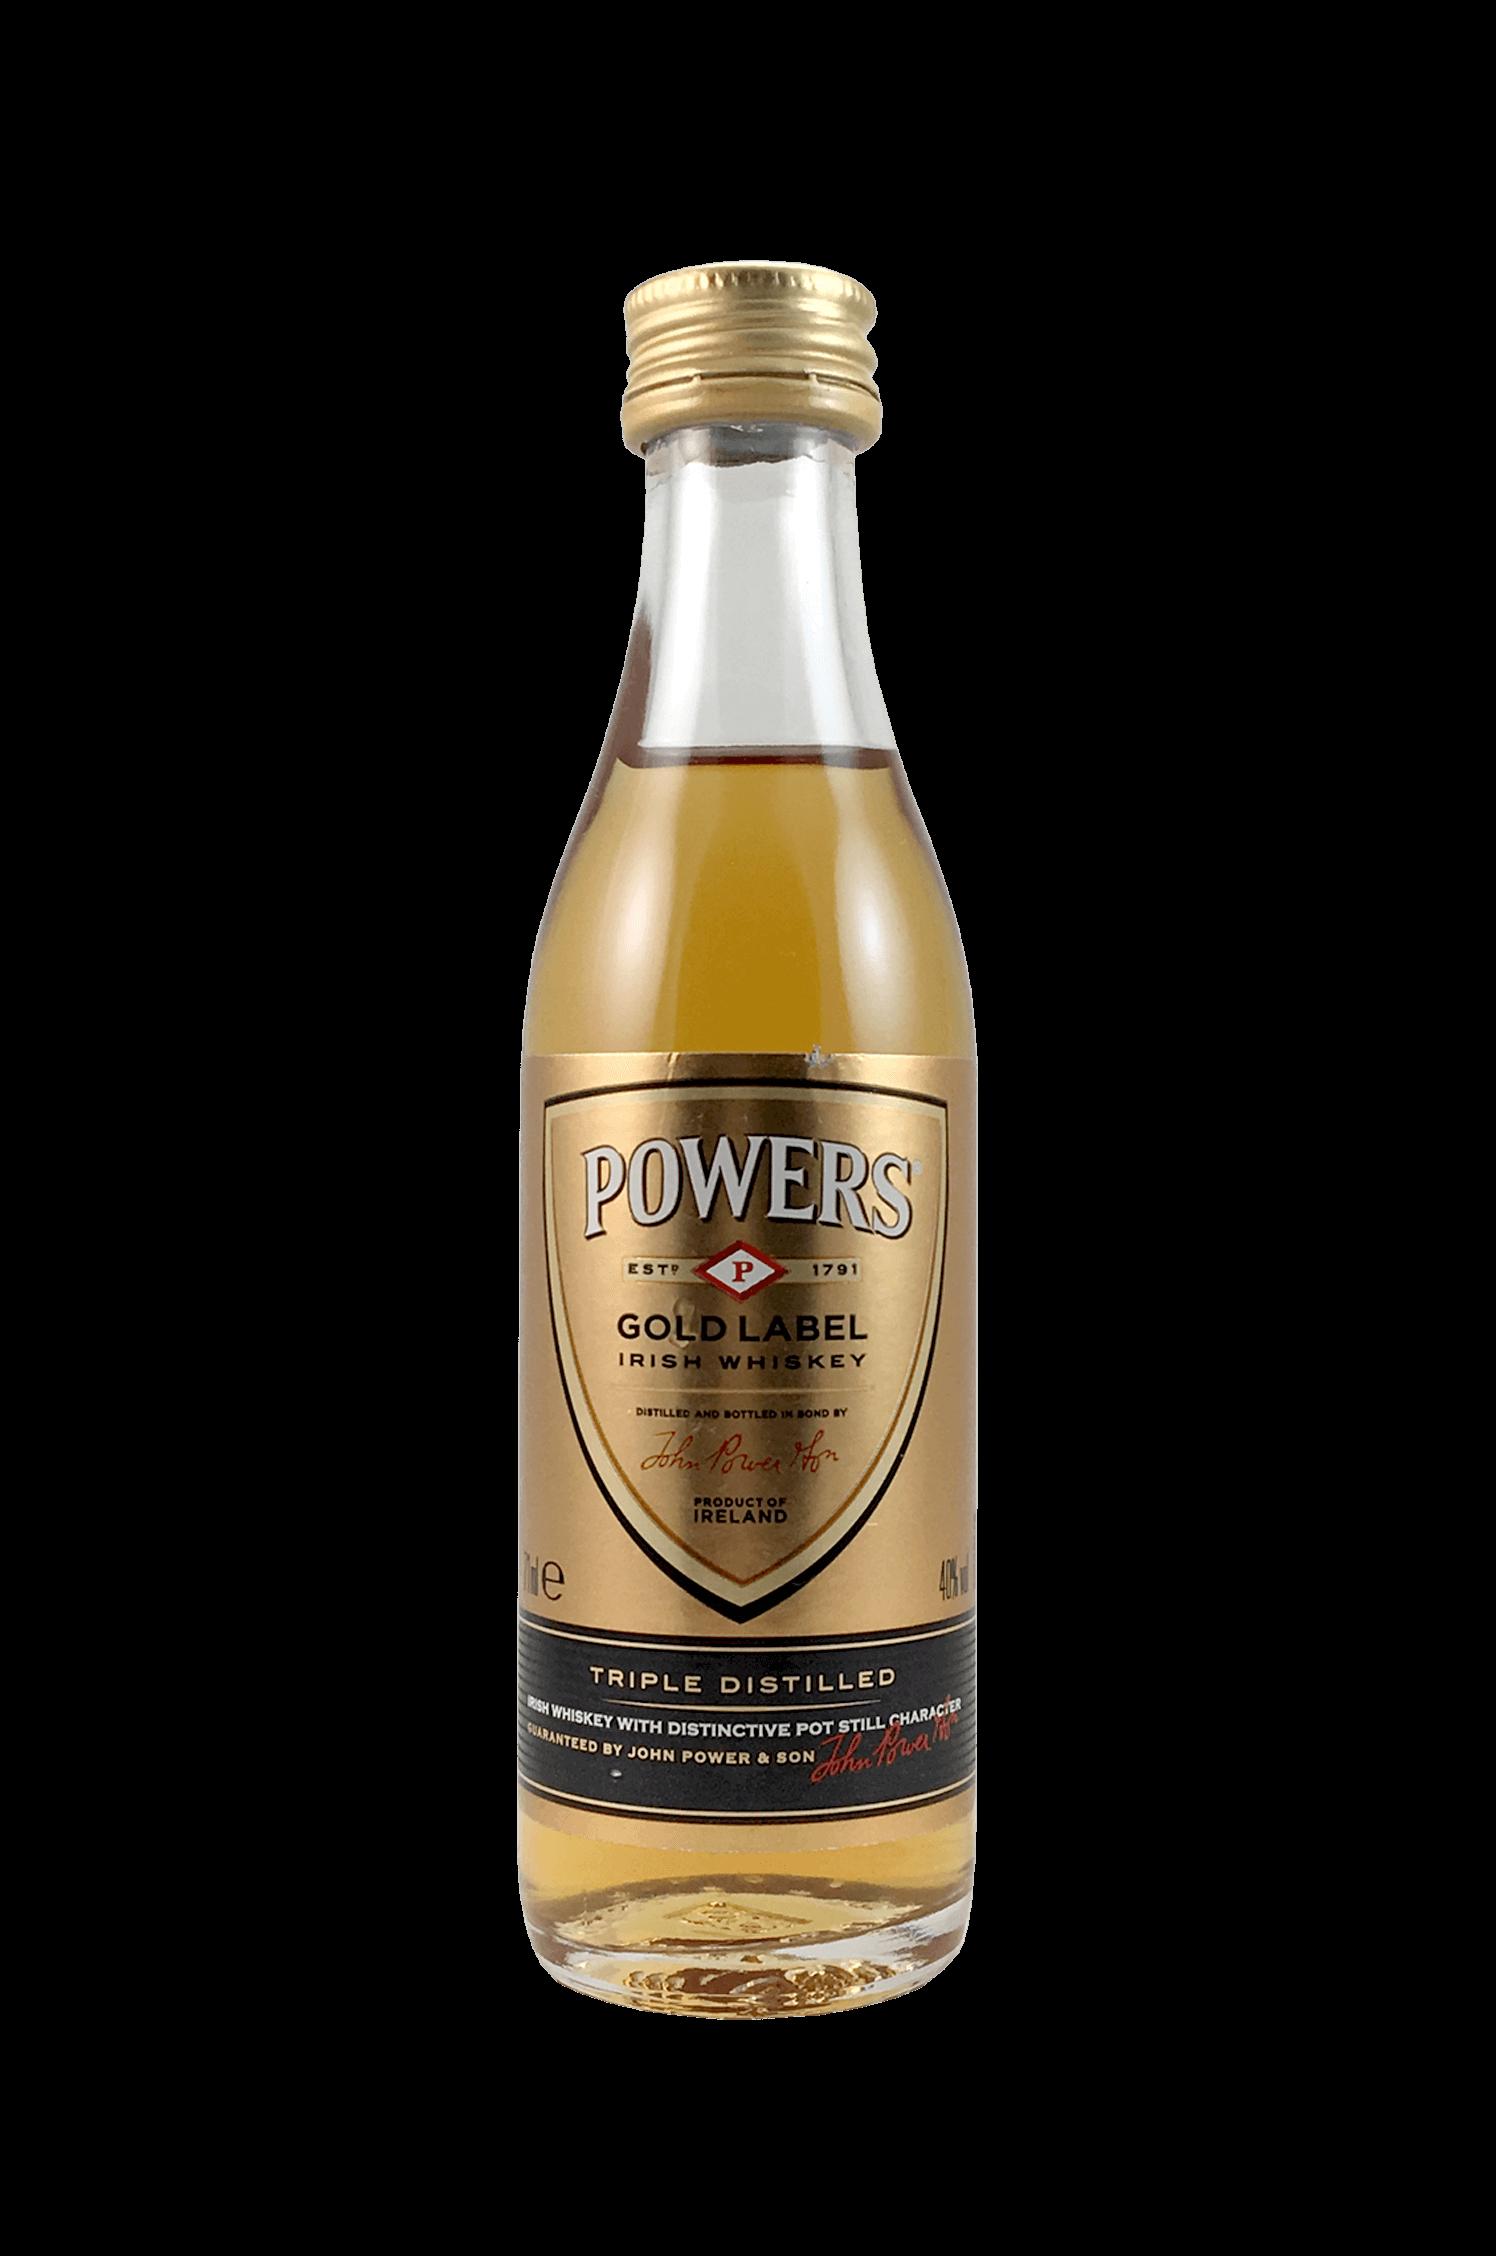 Powers Gold Label Irish Whisky